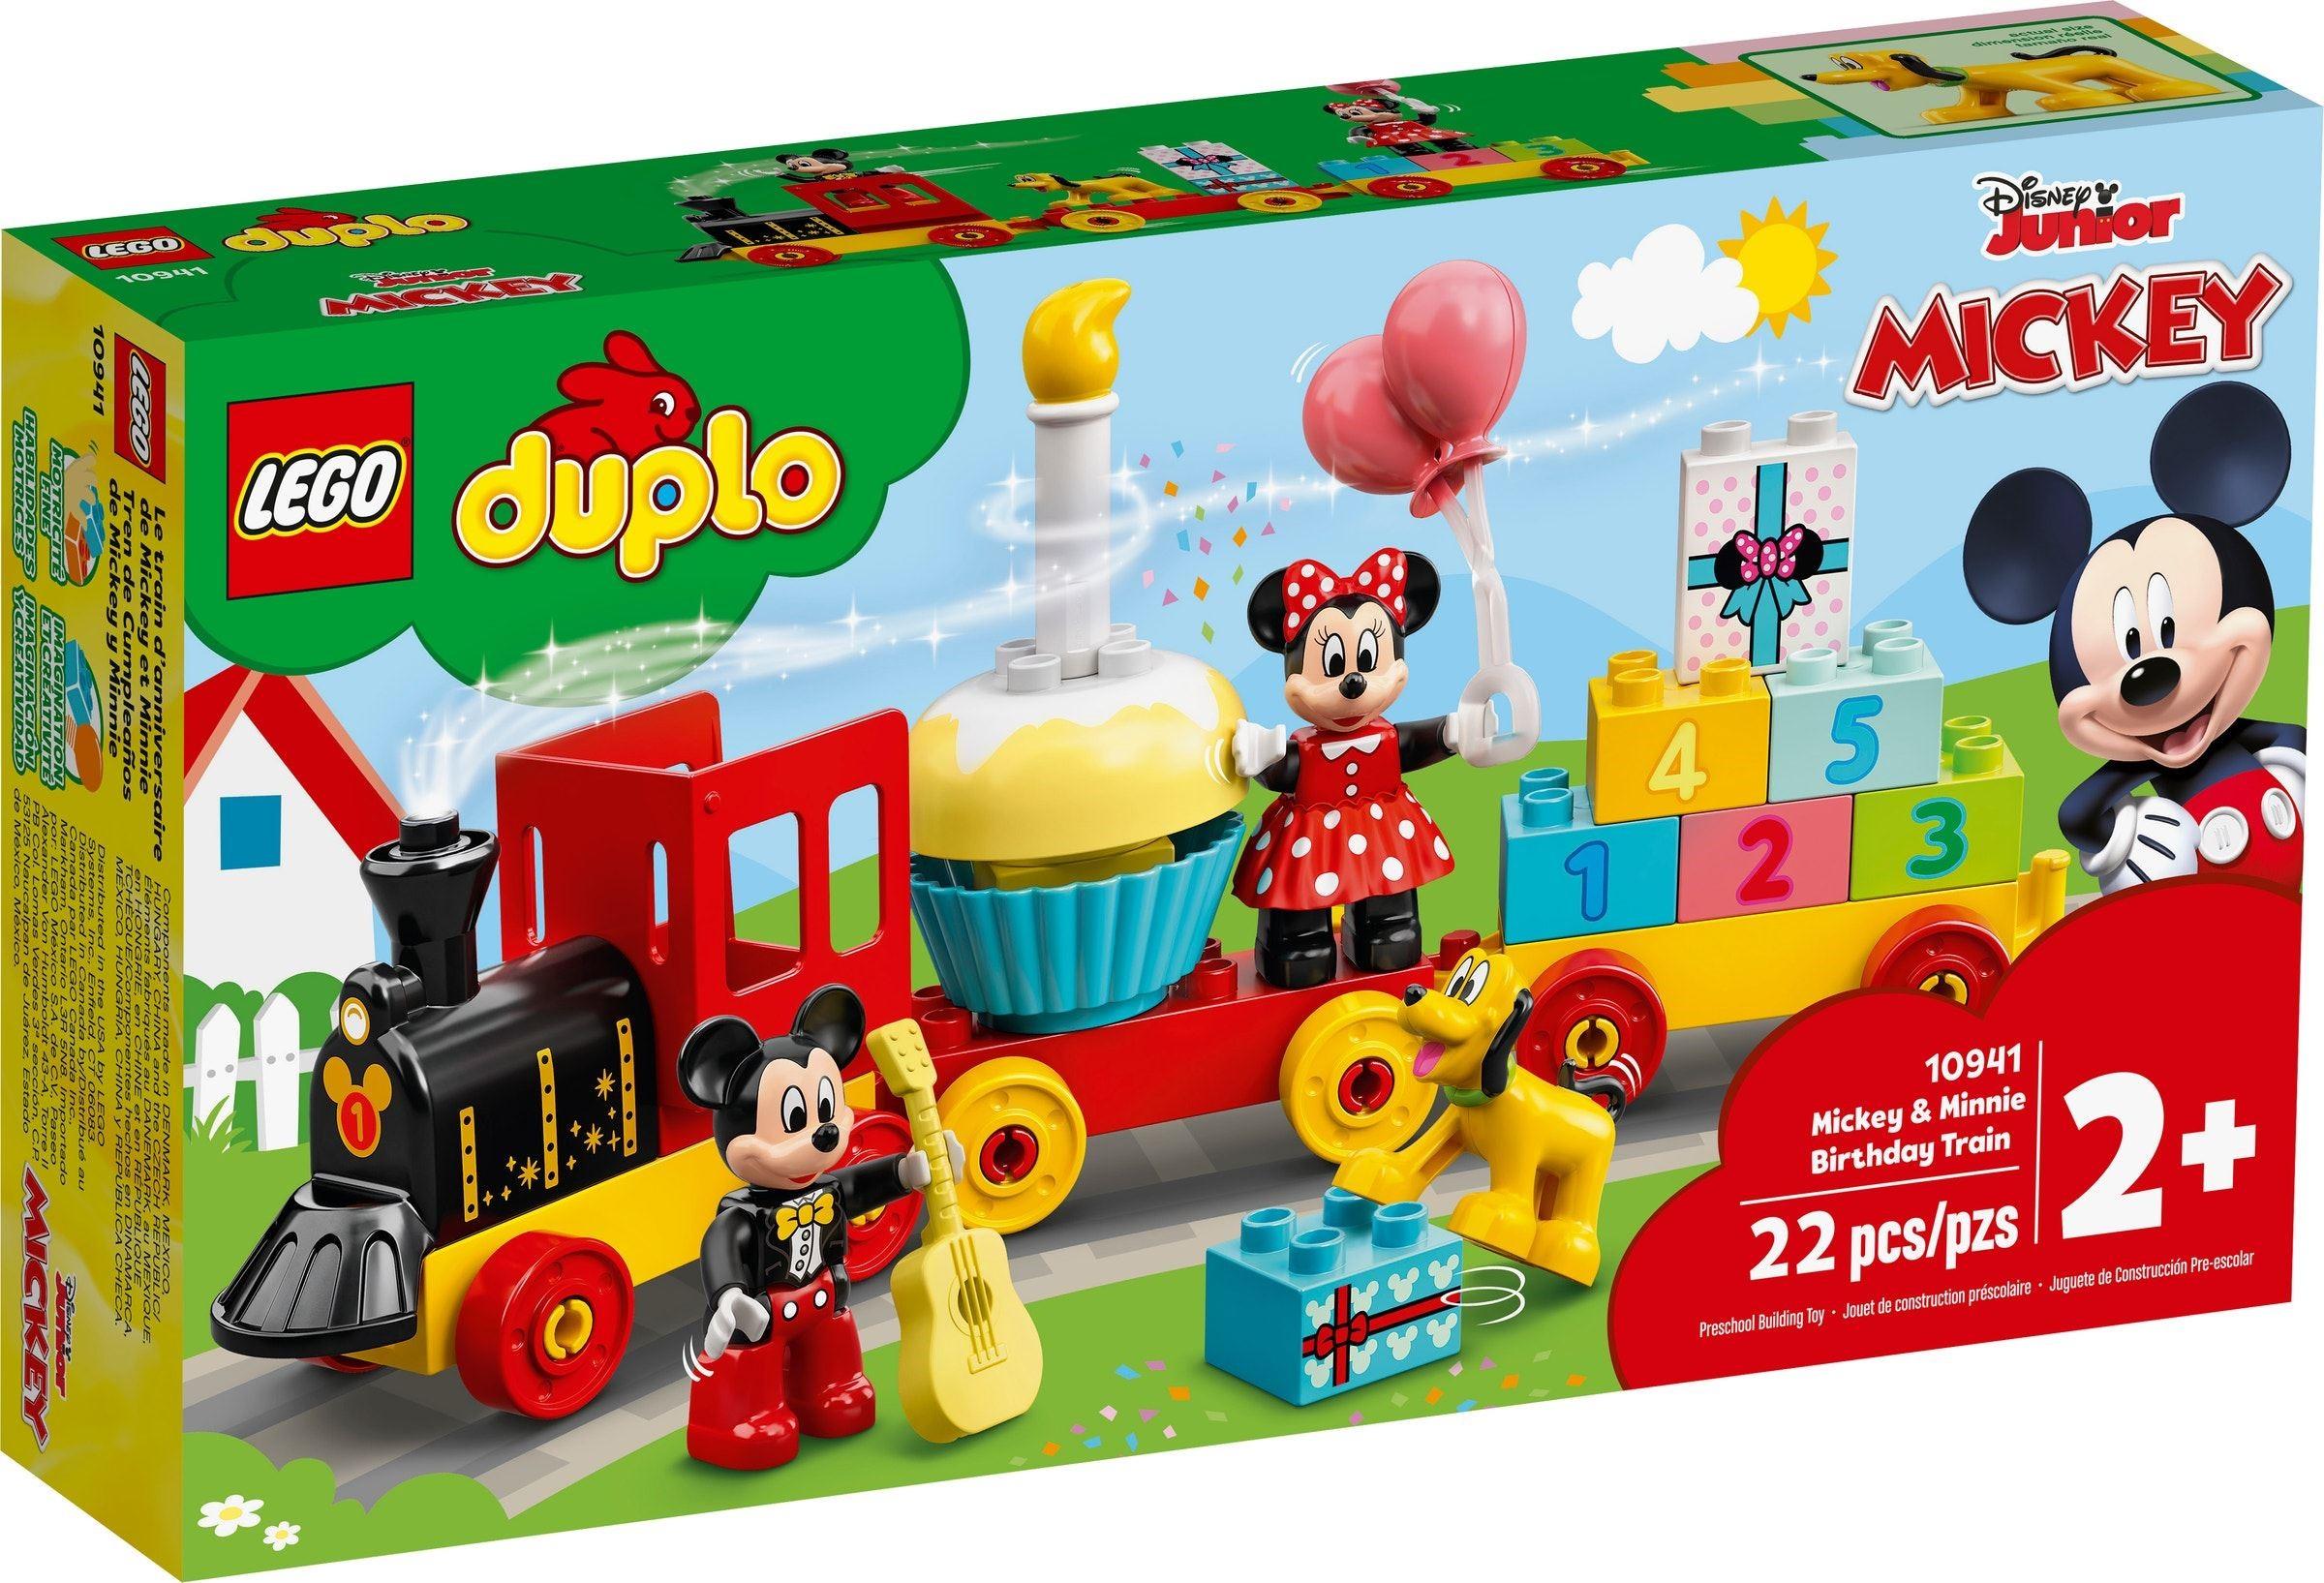 LEGO DUPLO - Mickey & Minnie Birthday Train (10941)